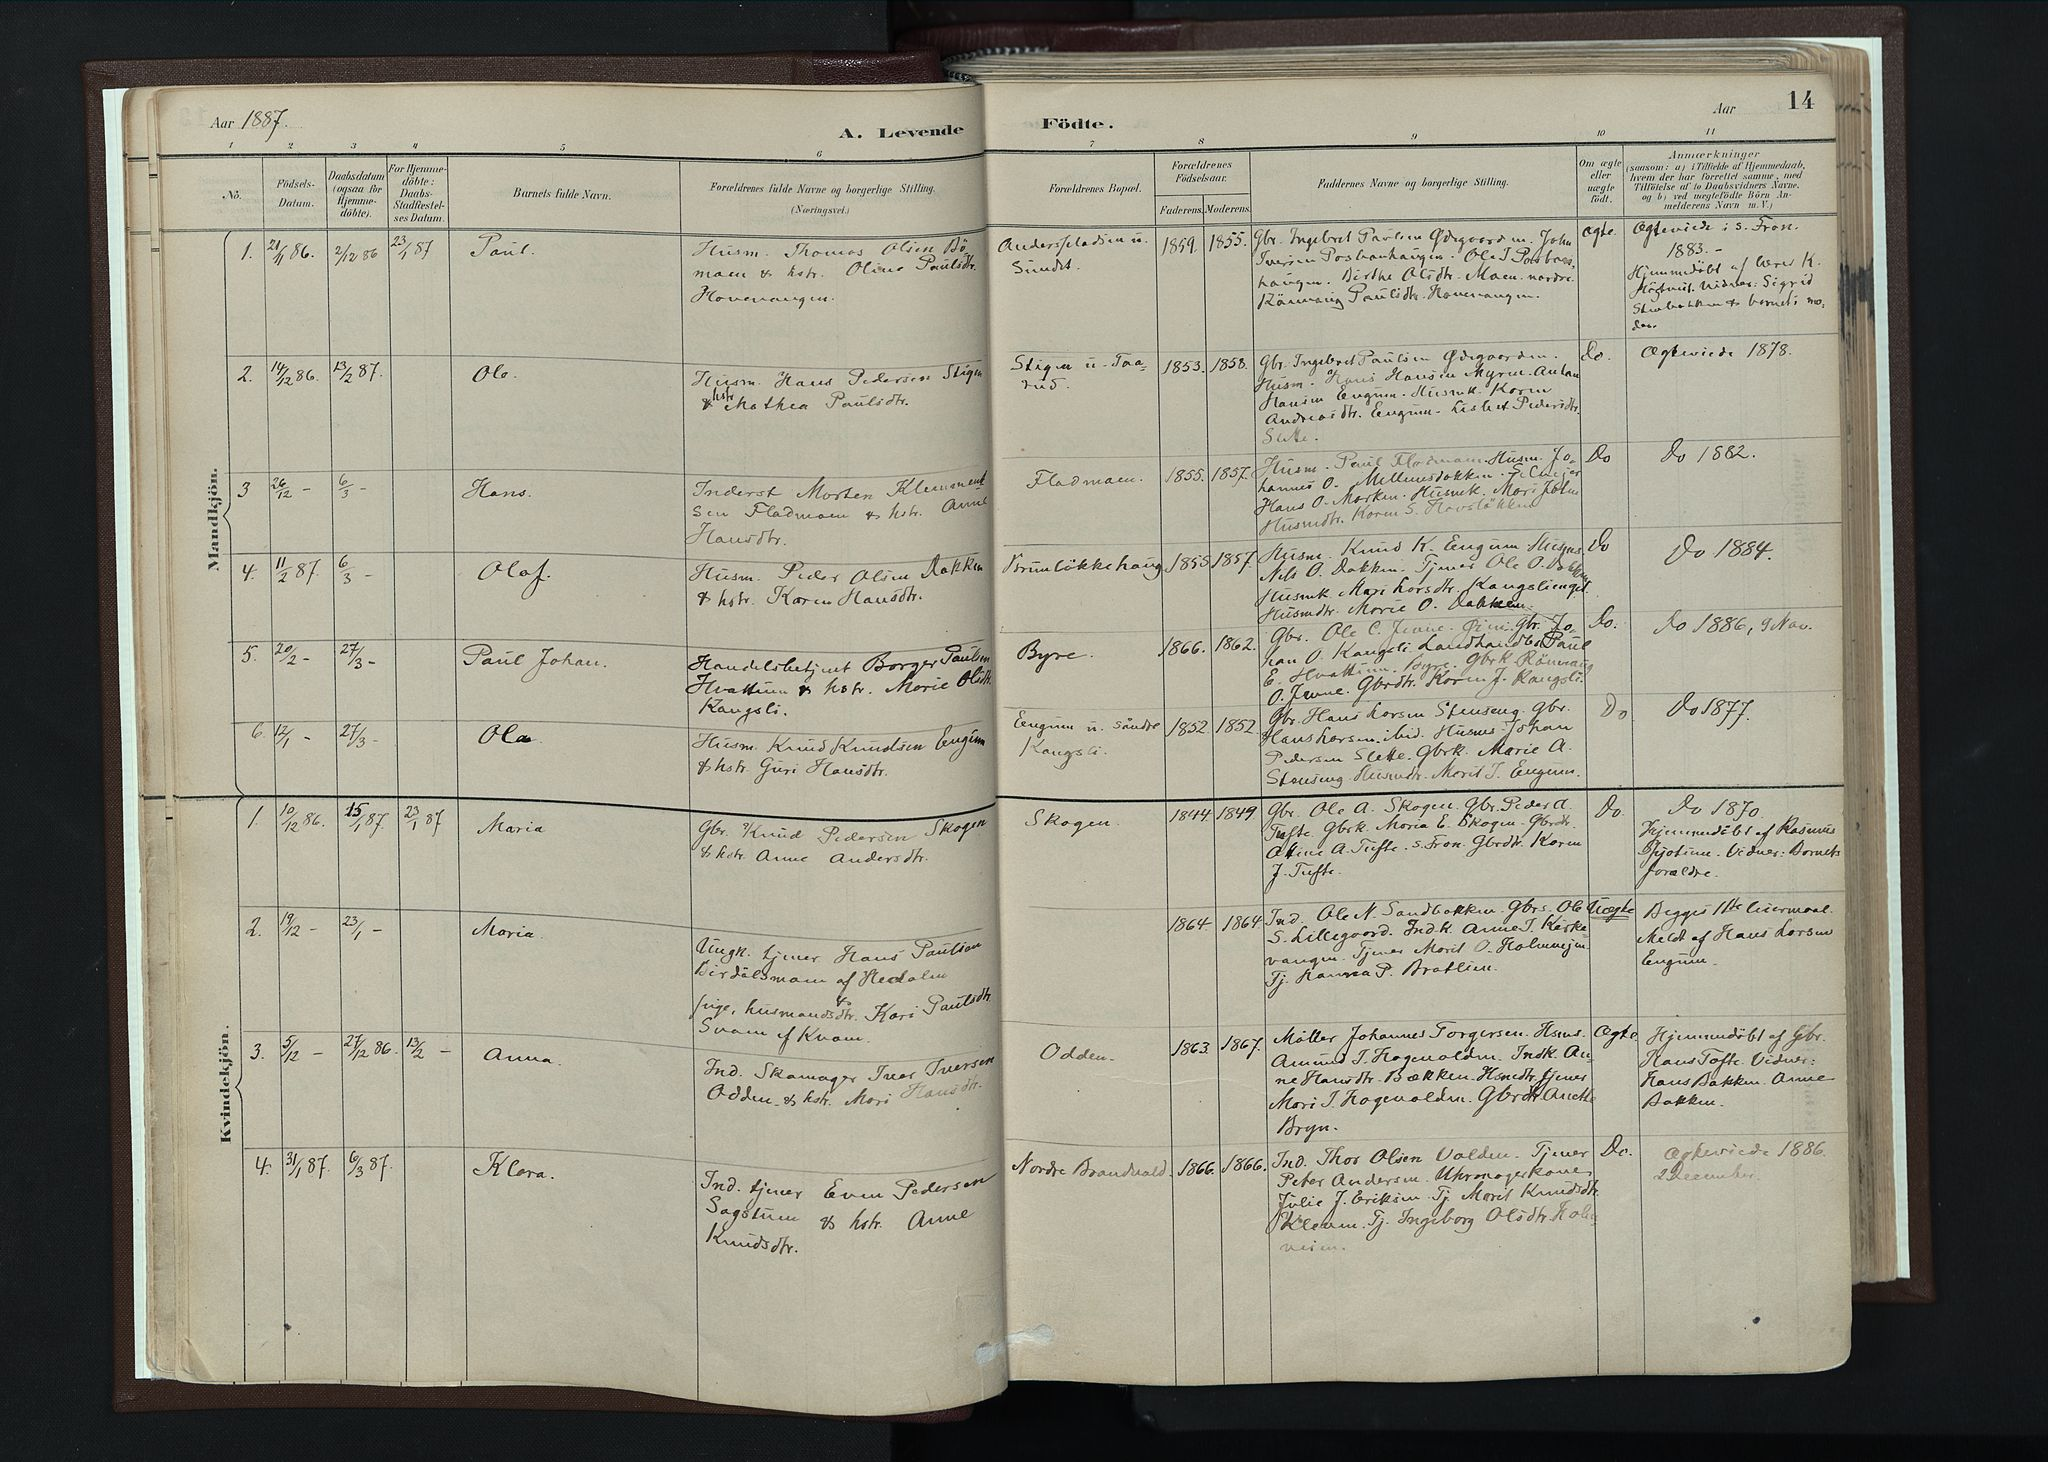 SAH, Nord-Fron prestekontor, Ministerialbok nr. 4, 1884-1914, s. 14